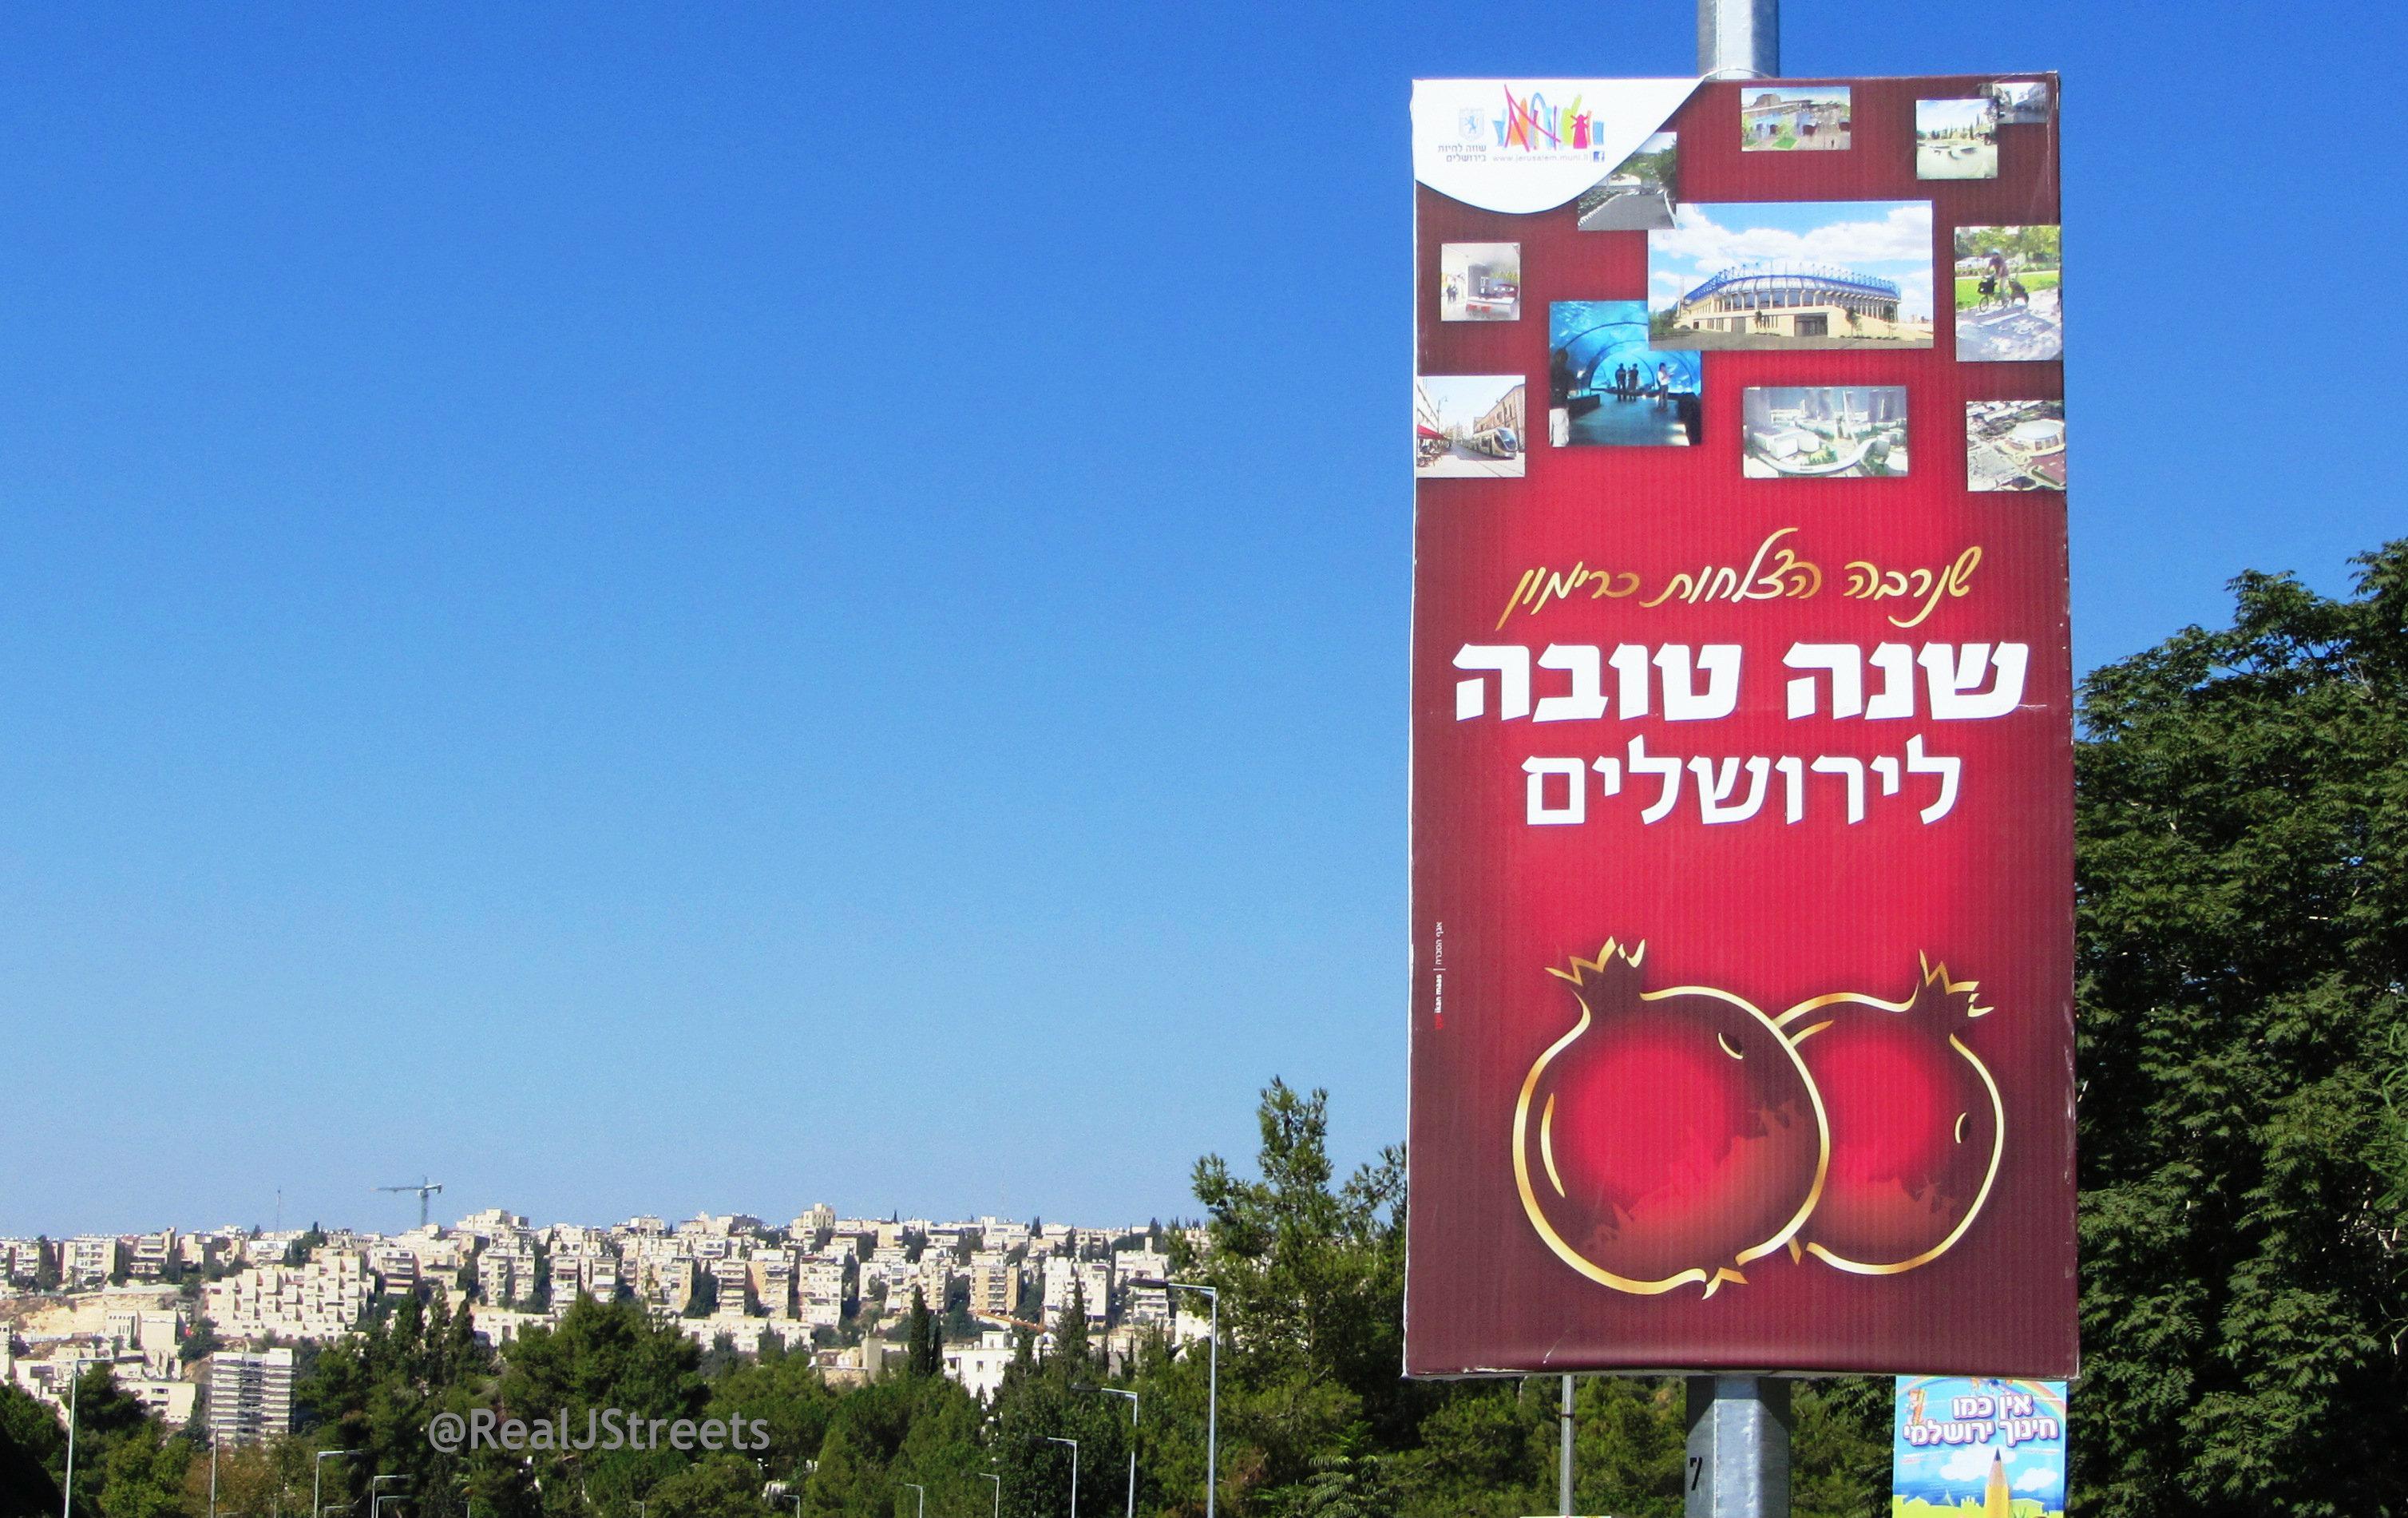 poster Shanah tovah, sign new year, image rosh Hashanah